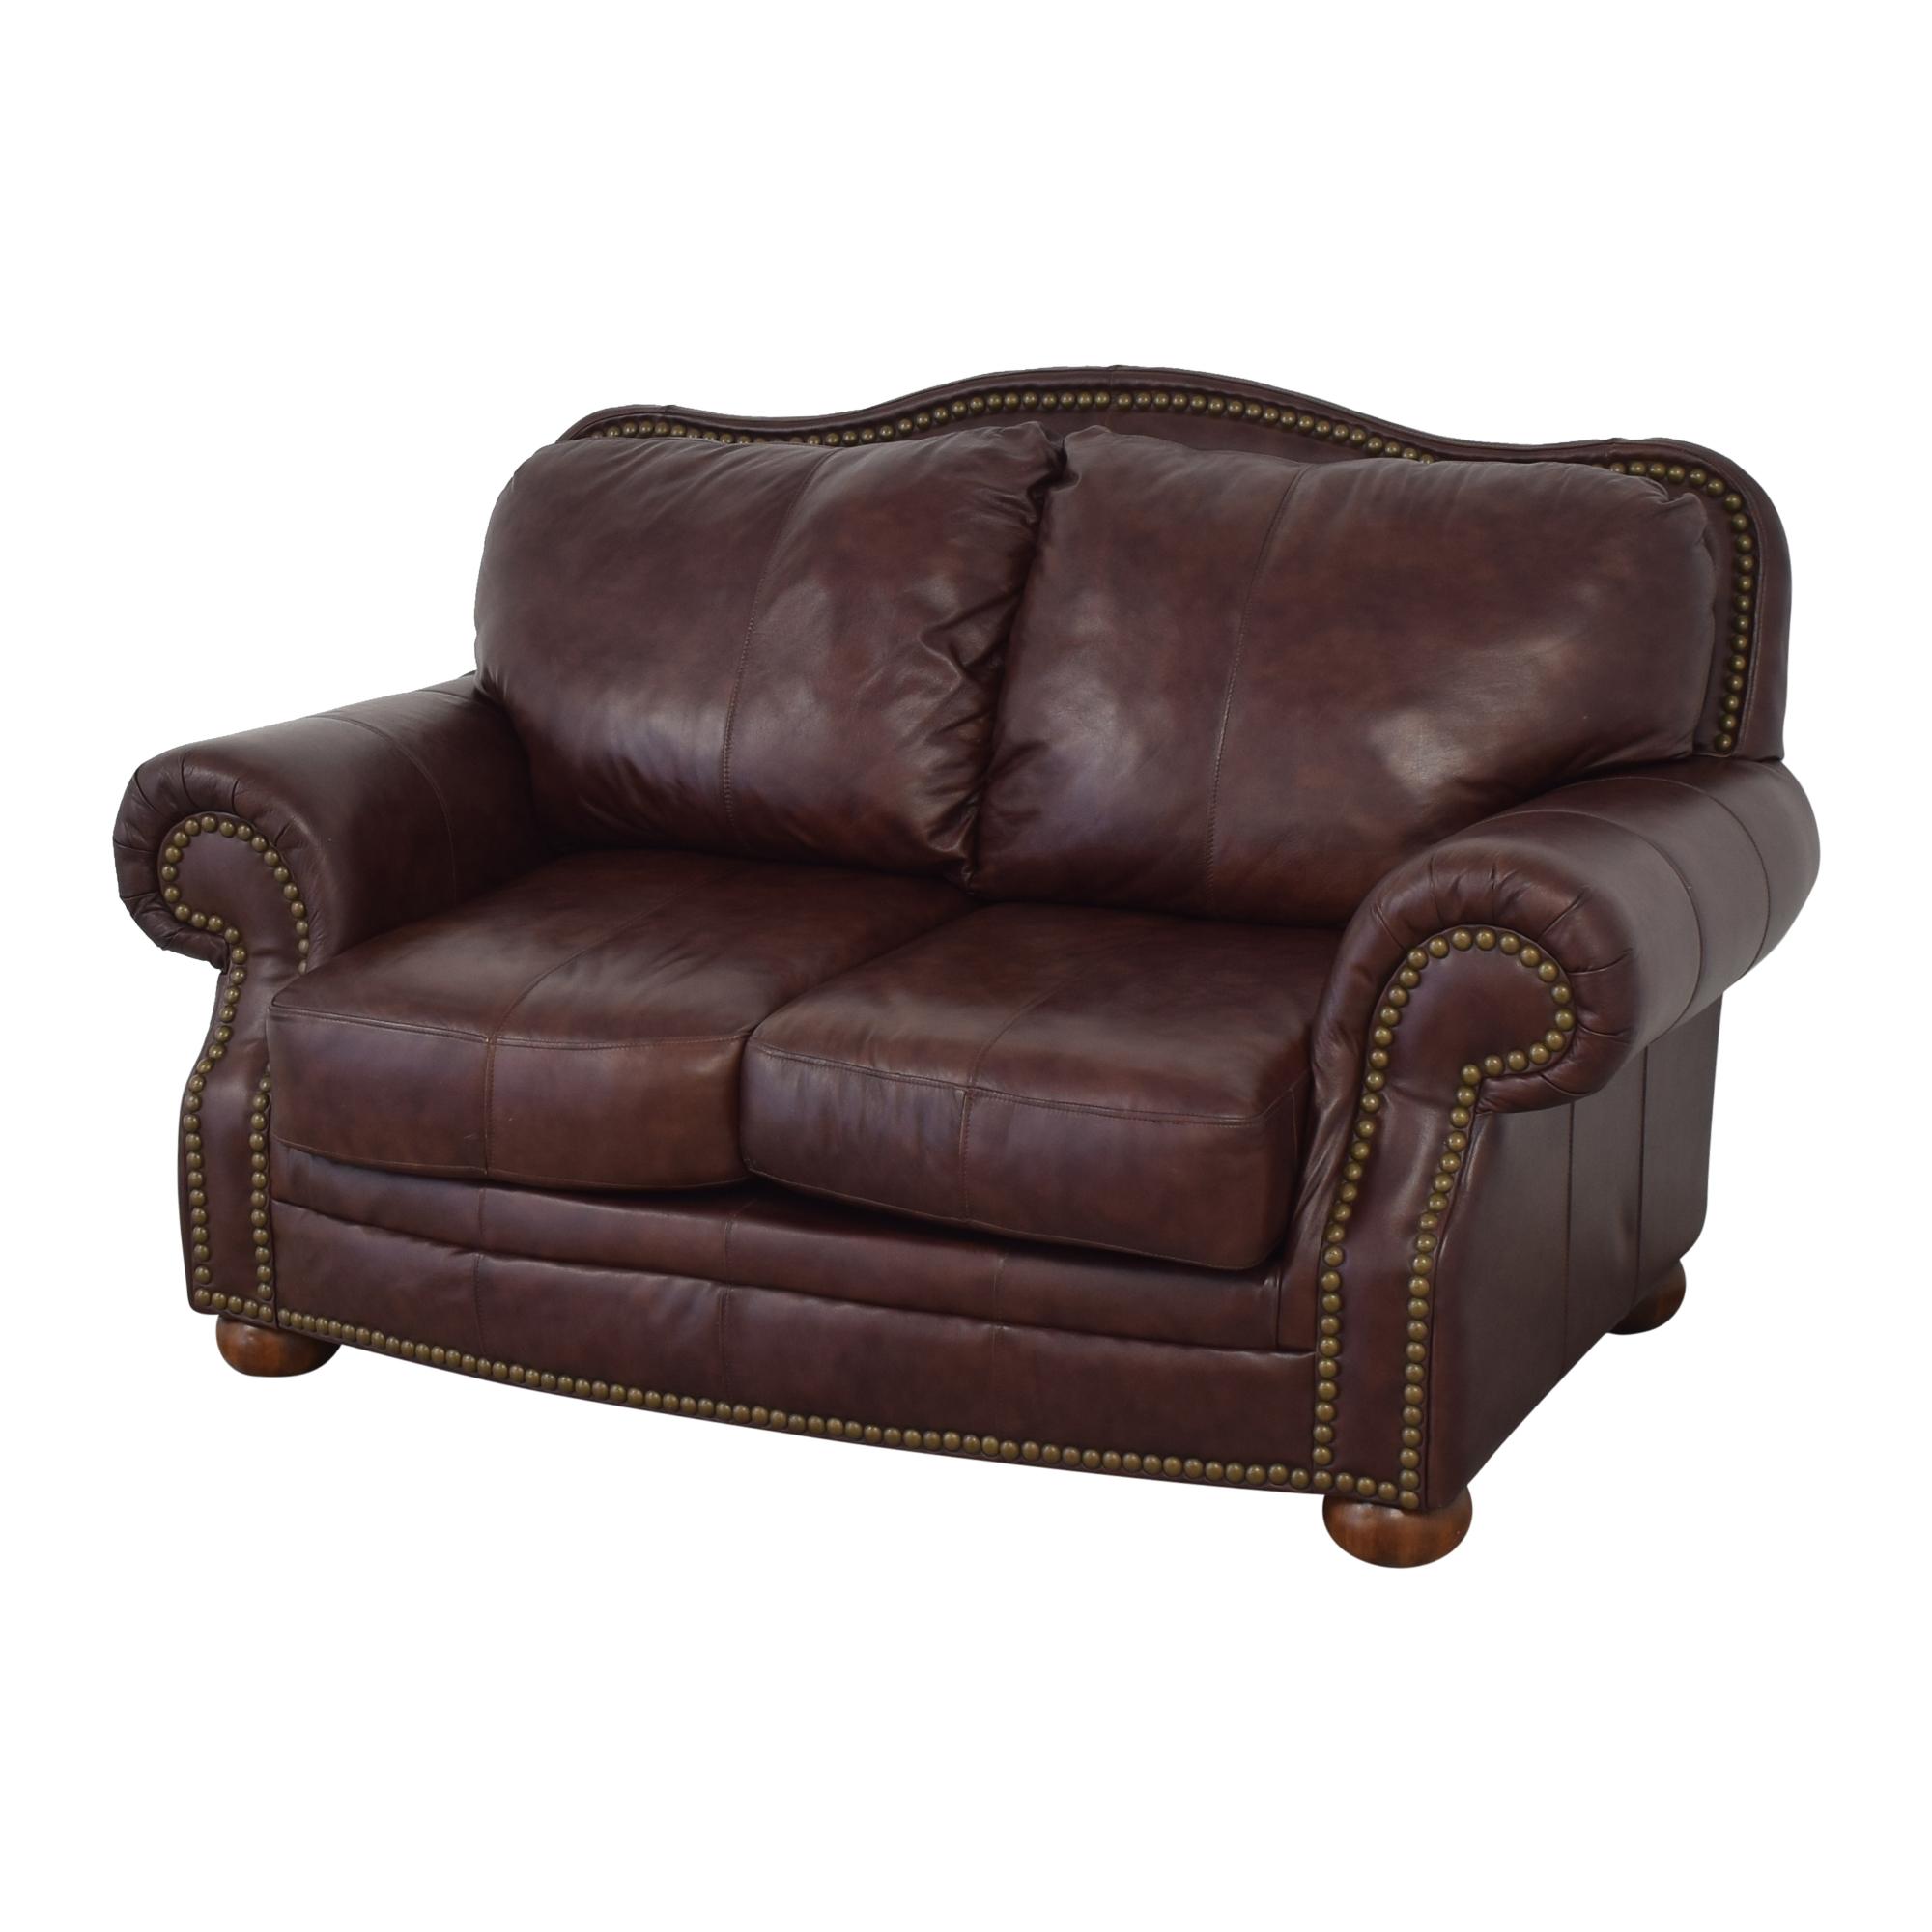 buy Ashley Furniture Nailhead Trim Loveseat Ashley Furniture Sofas